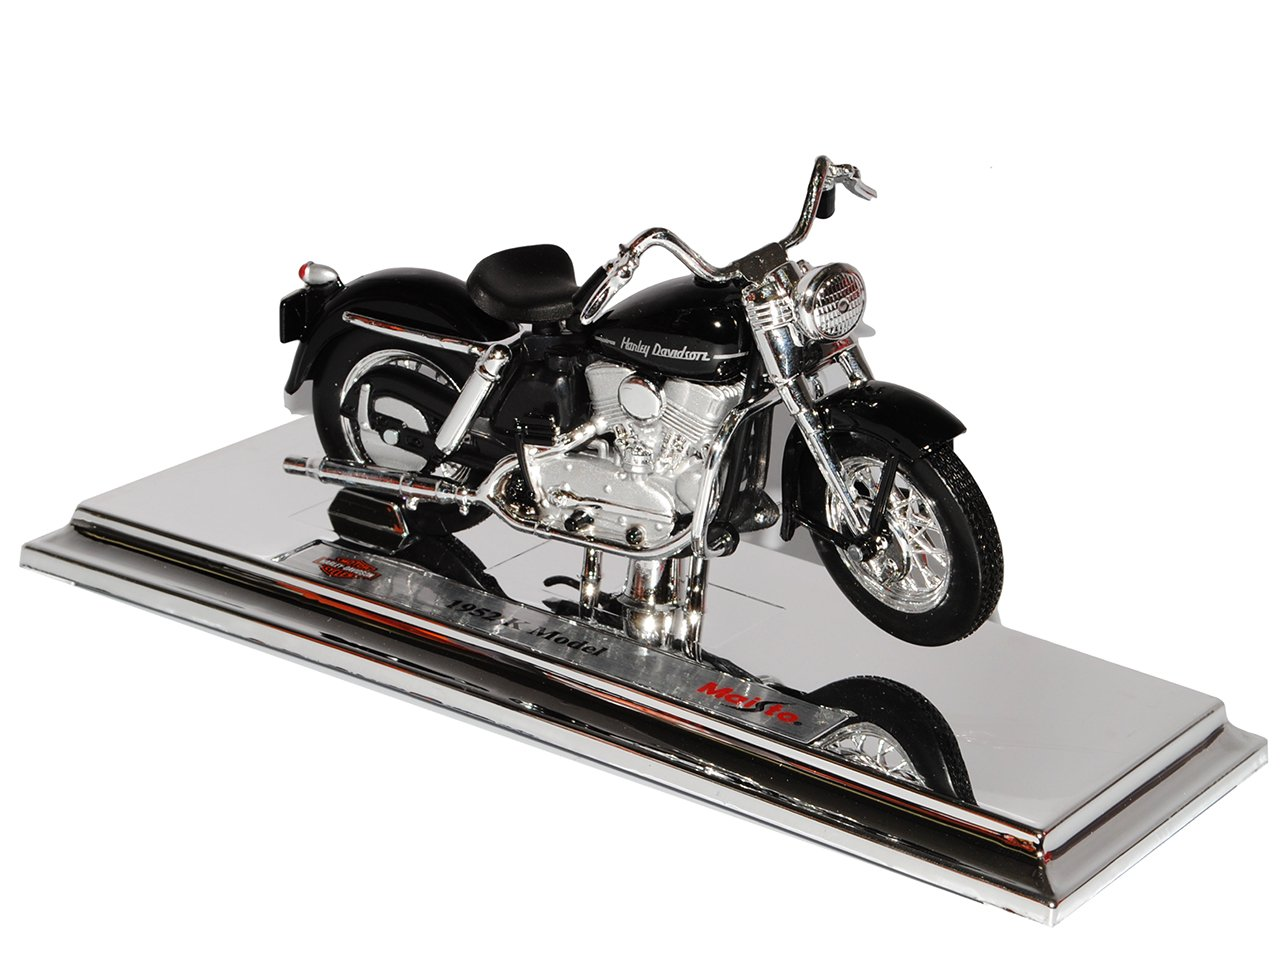 Harley Davidson 1952K Nero 1/18Maisto modello Frecce con o senza individiuellem richiesta Targa Modellcarsonline